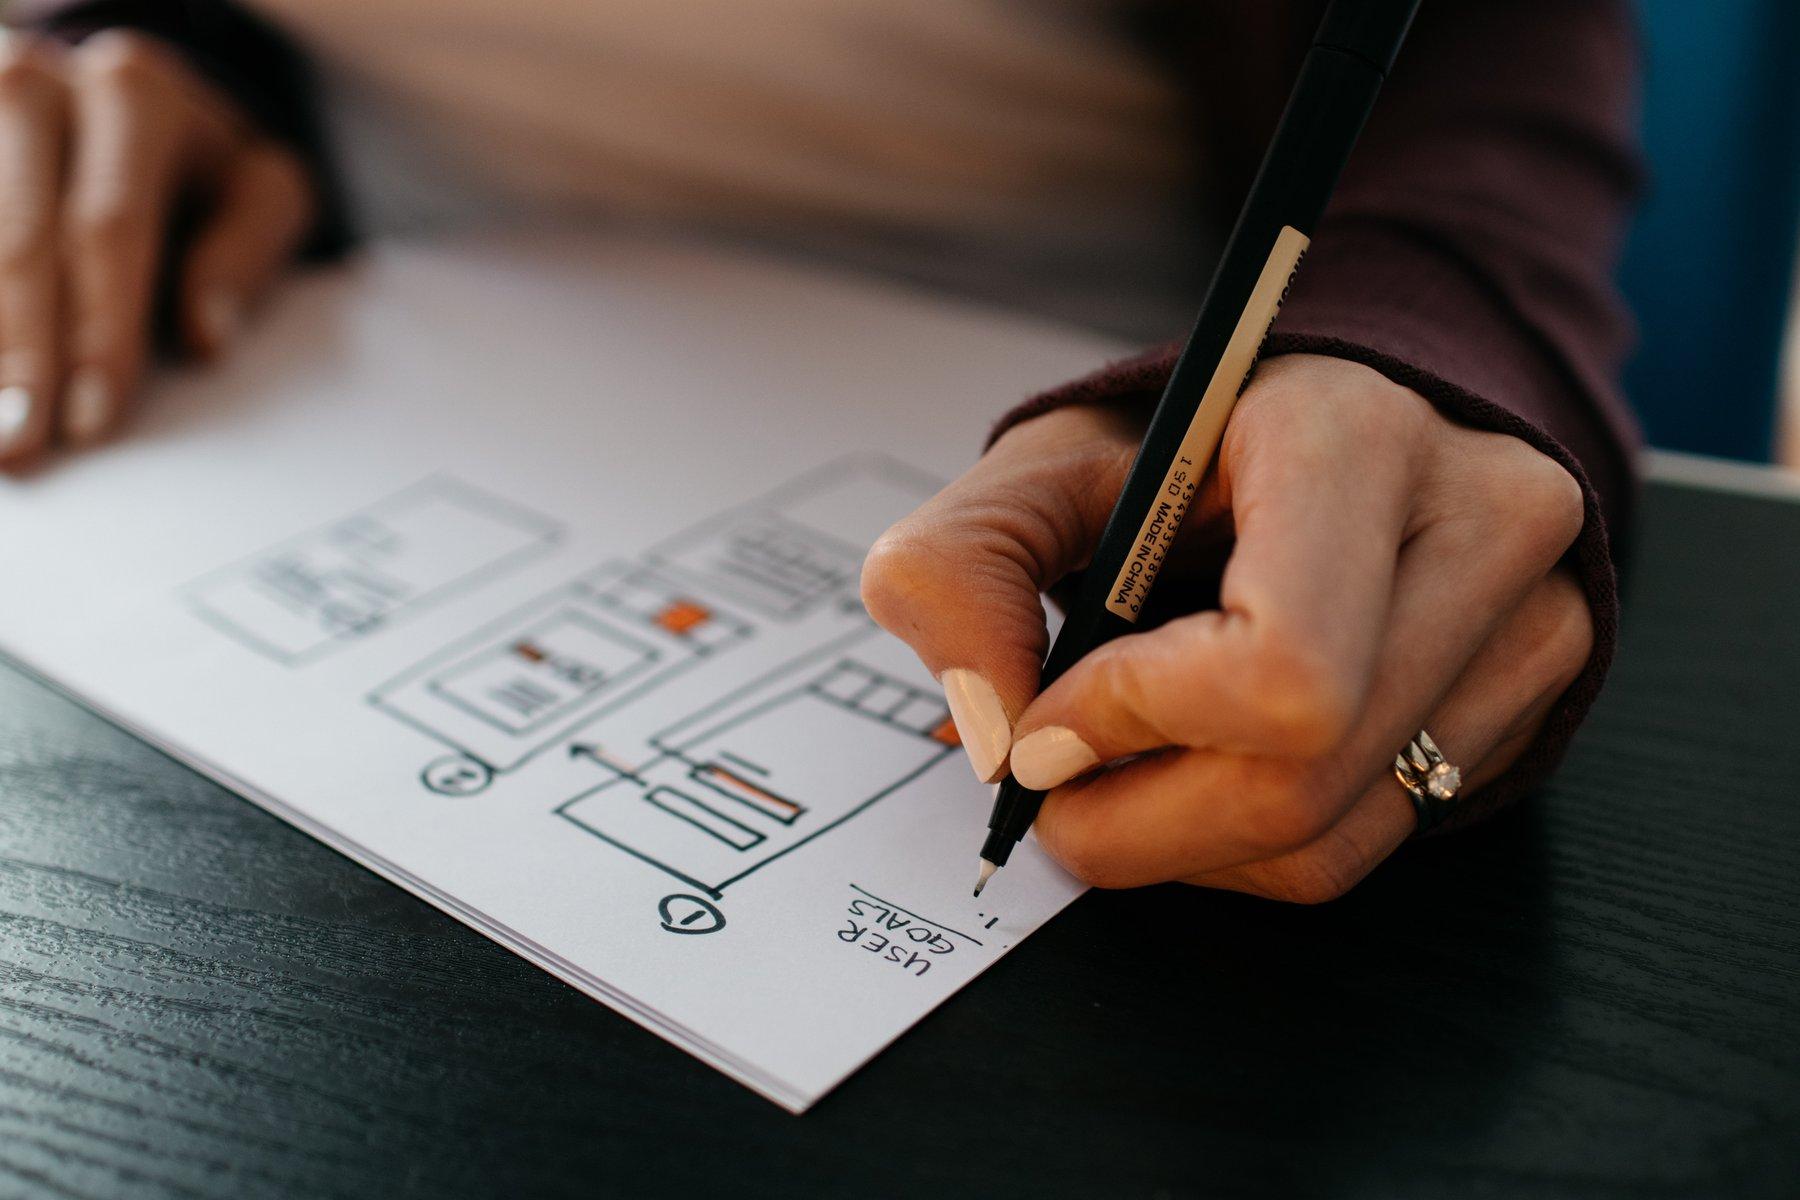 Woman writing a plan down on paper